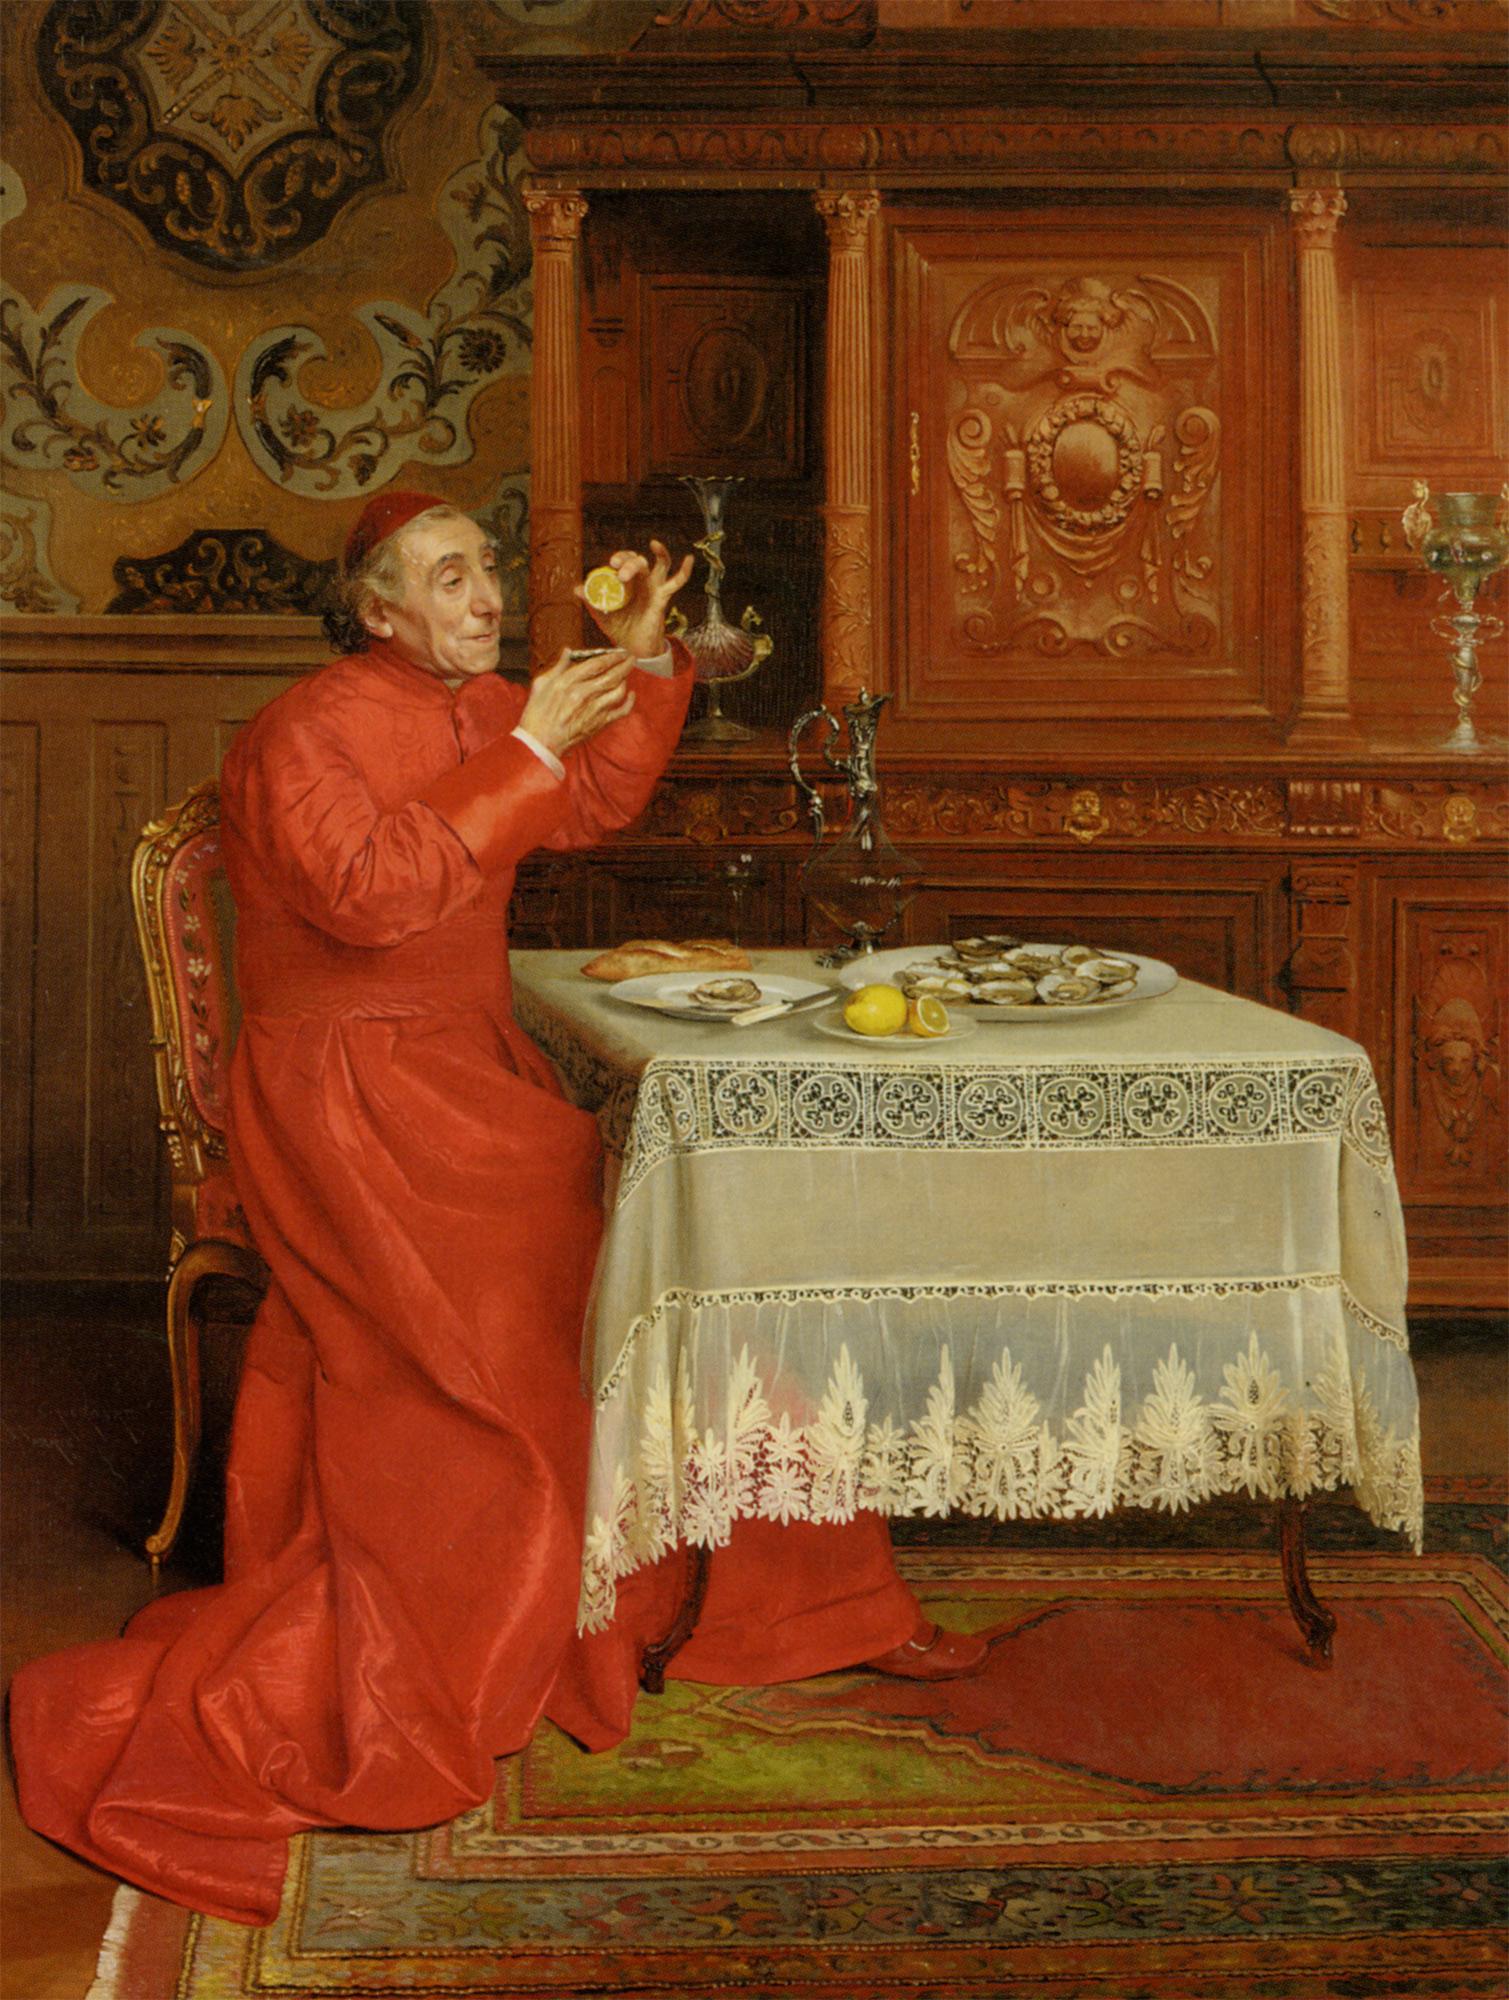 The gourmet :: Georges Croegaert - Rich interiors ôîòî